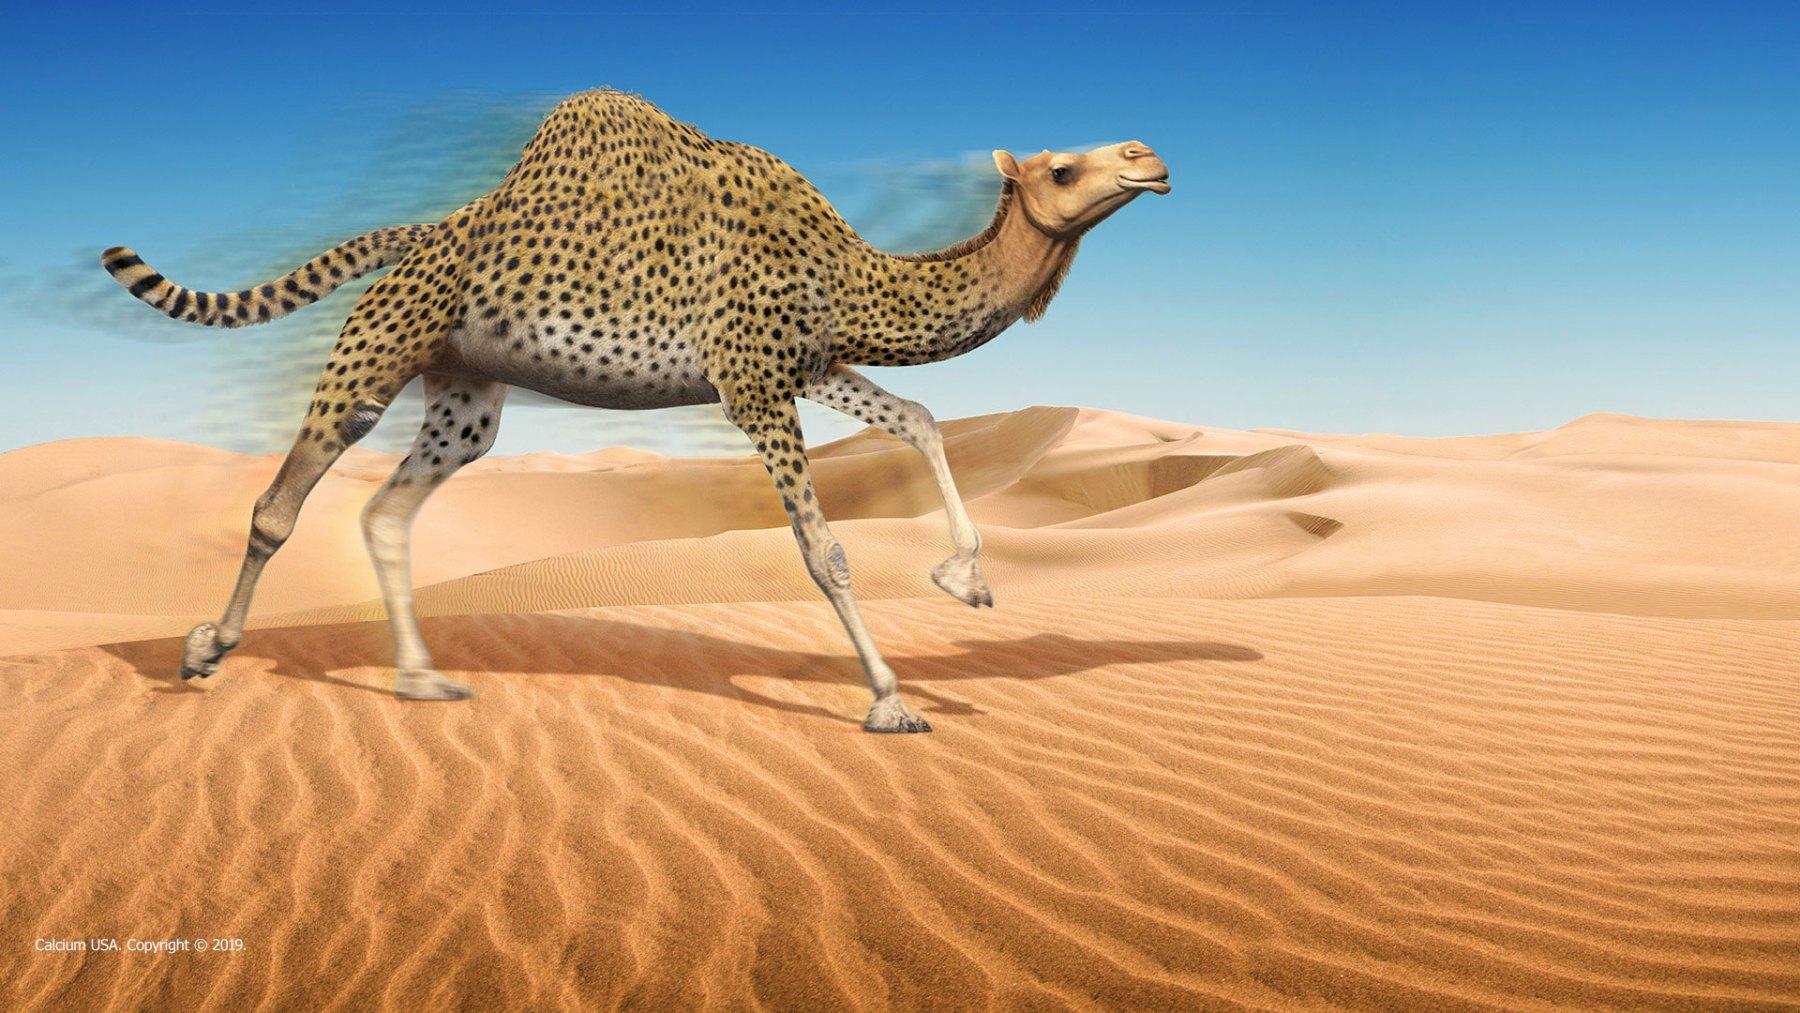 CHEETAH CAMEL